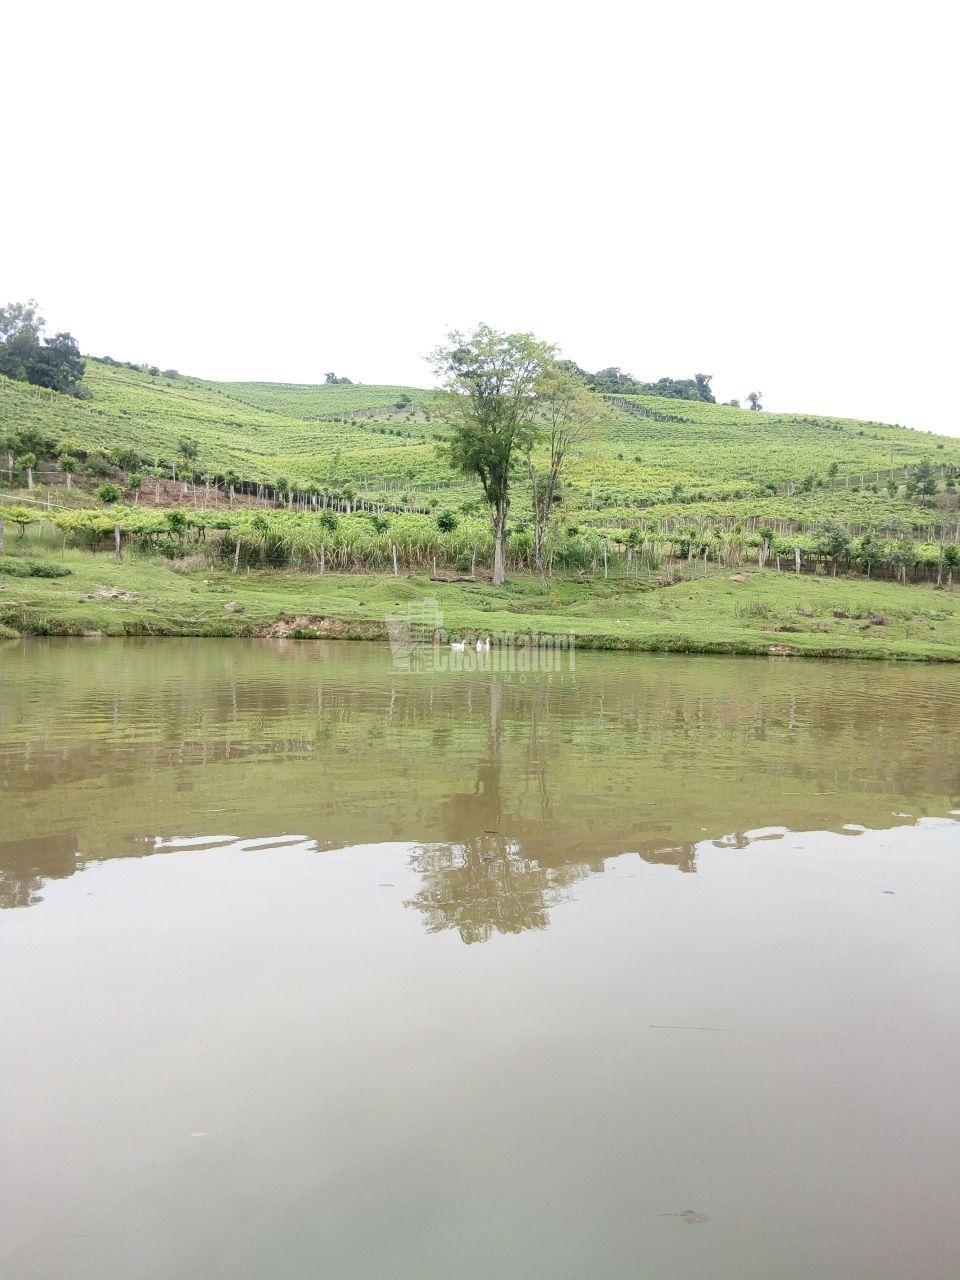 Terreno/Lote à venda  no Zona Rural - Monte Belo do Sul, RS. Imóveis